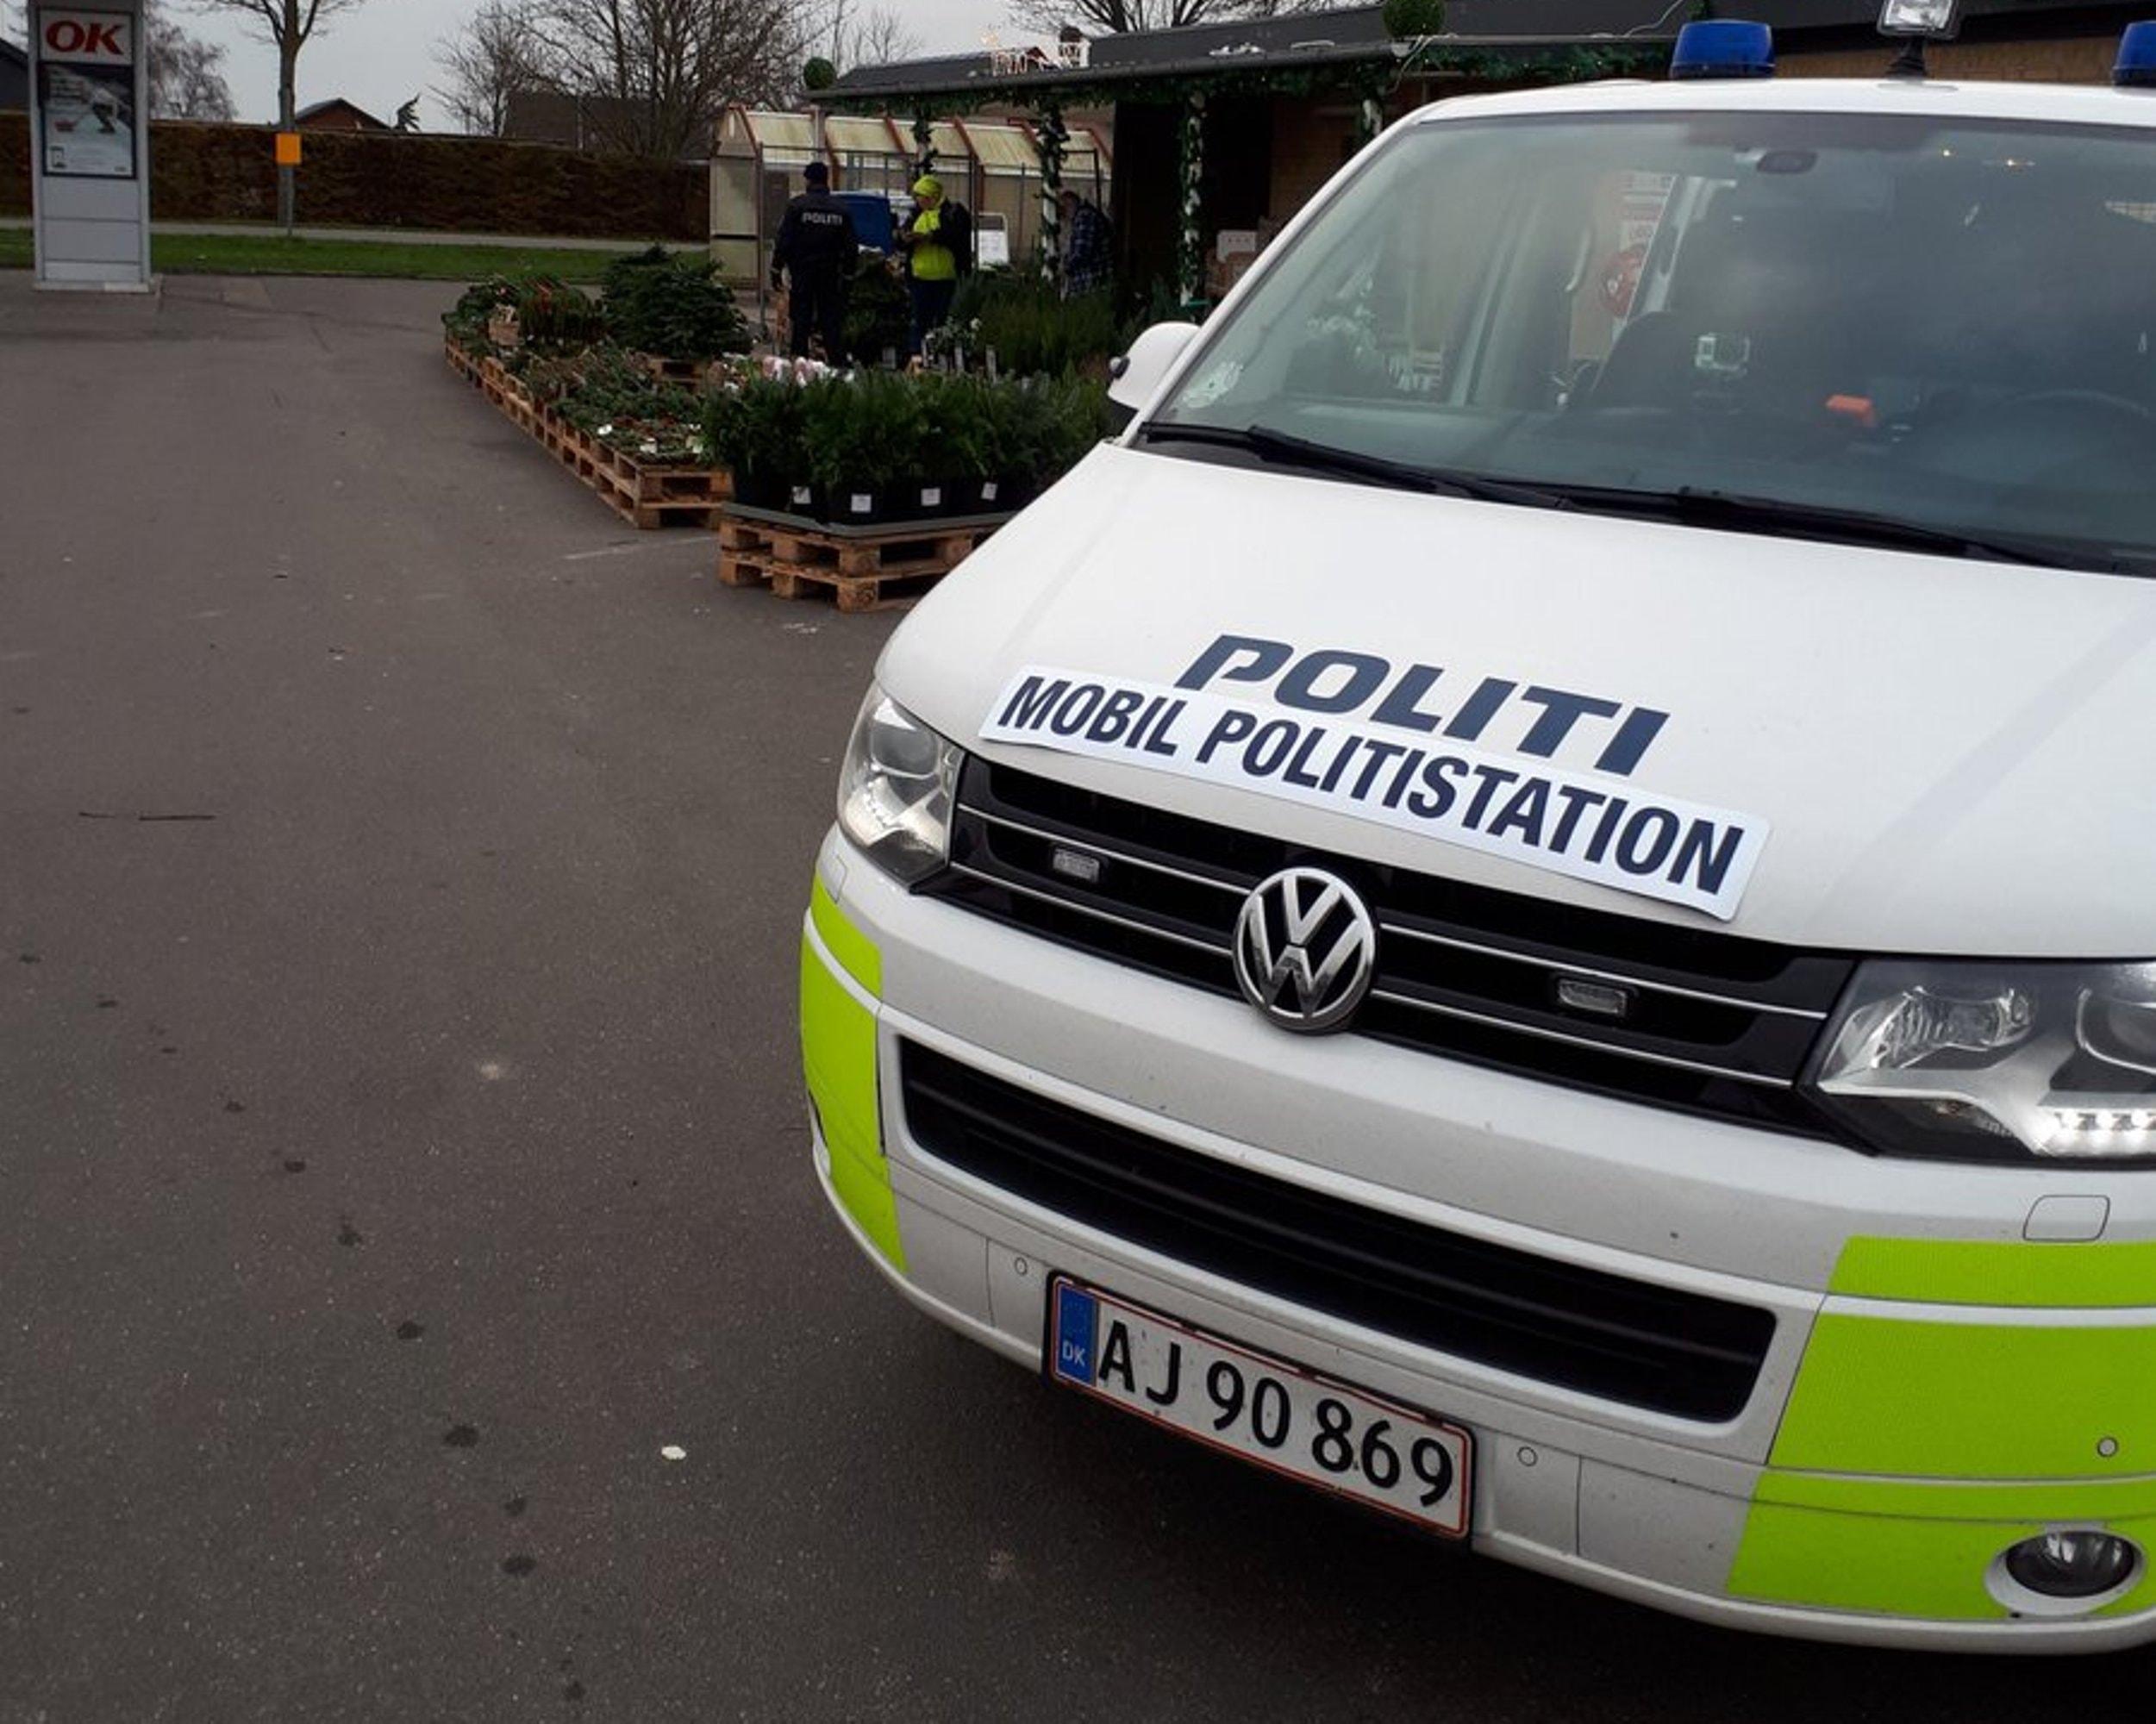 Mobil politistationen i Horslunde